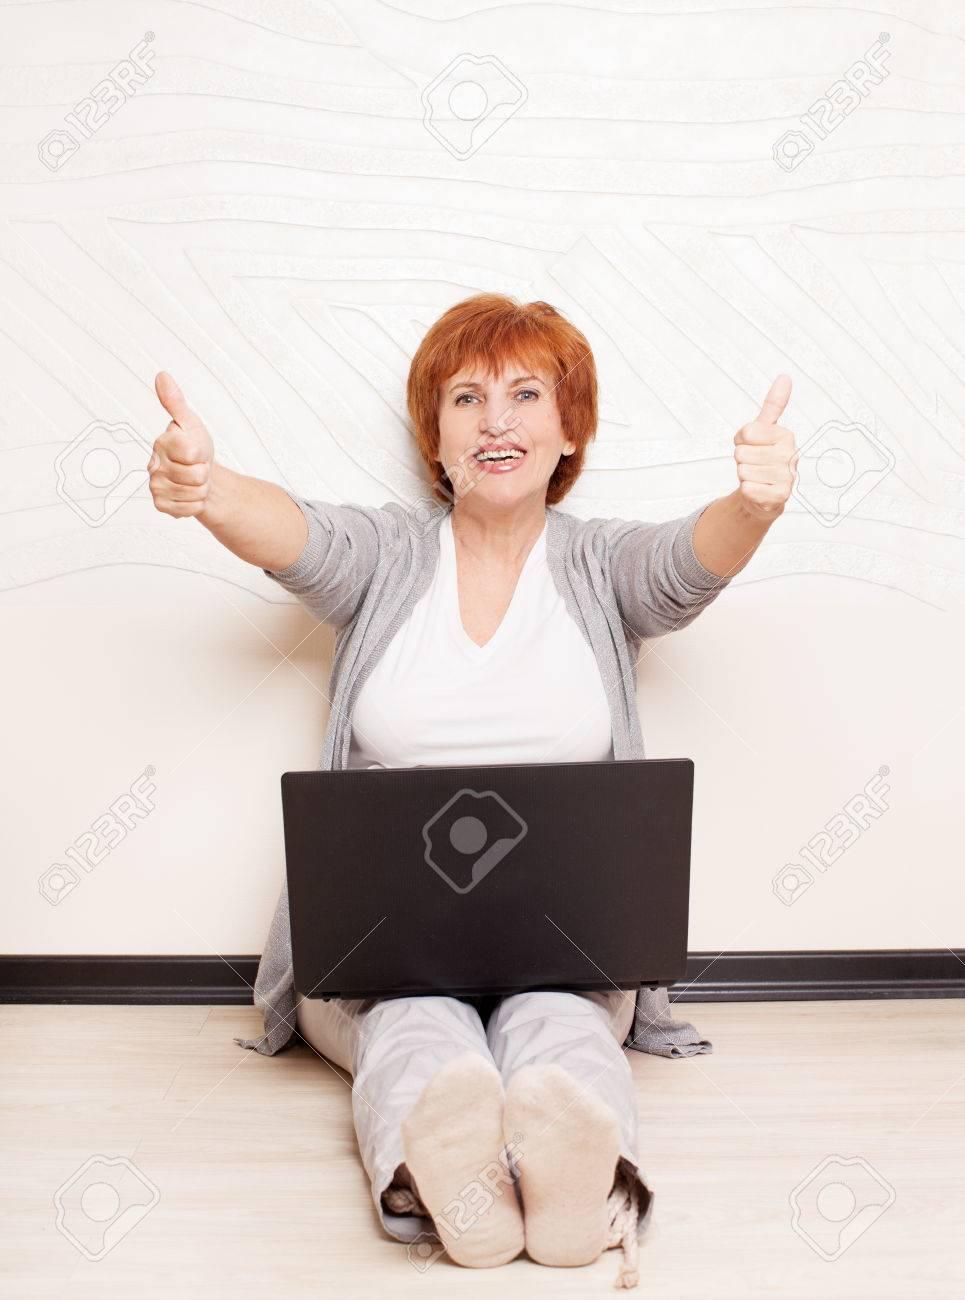 Сайт зрелых женщин 24 фотография